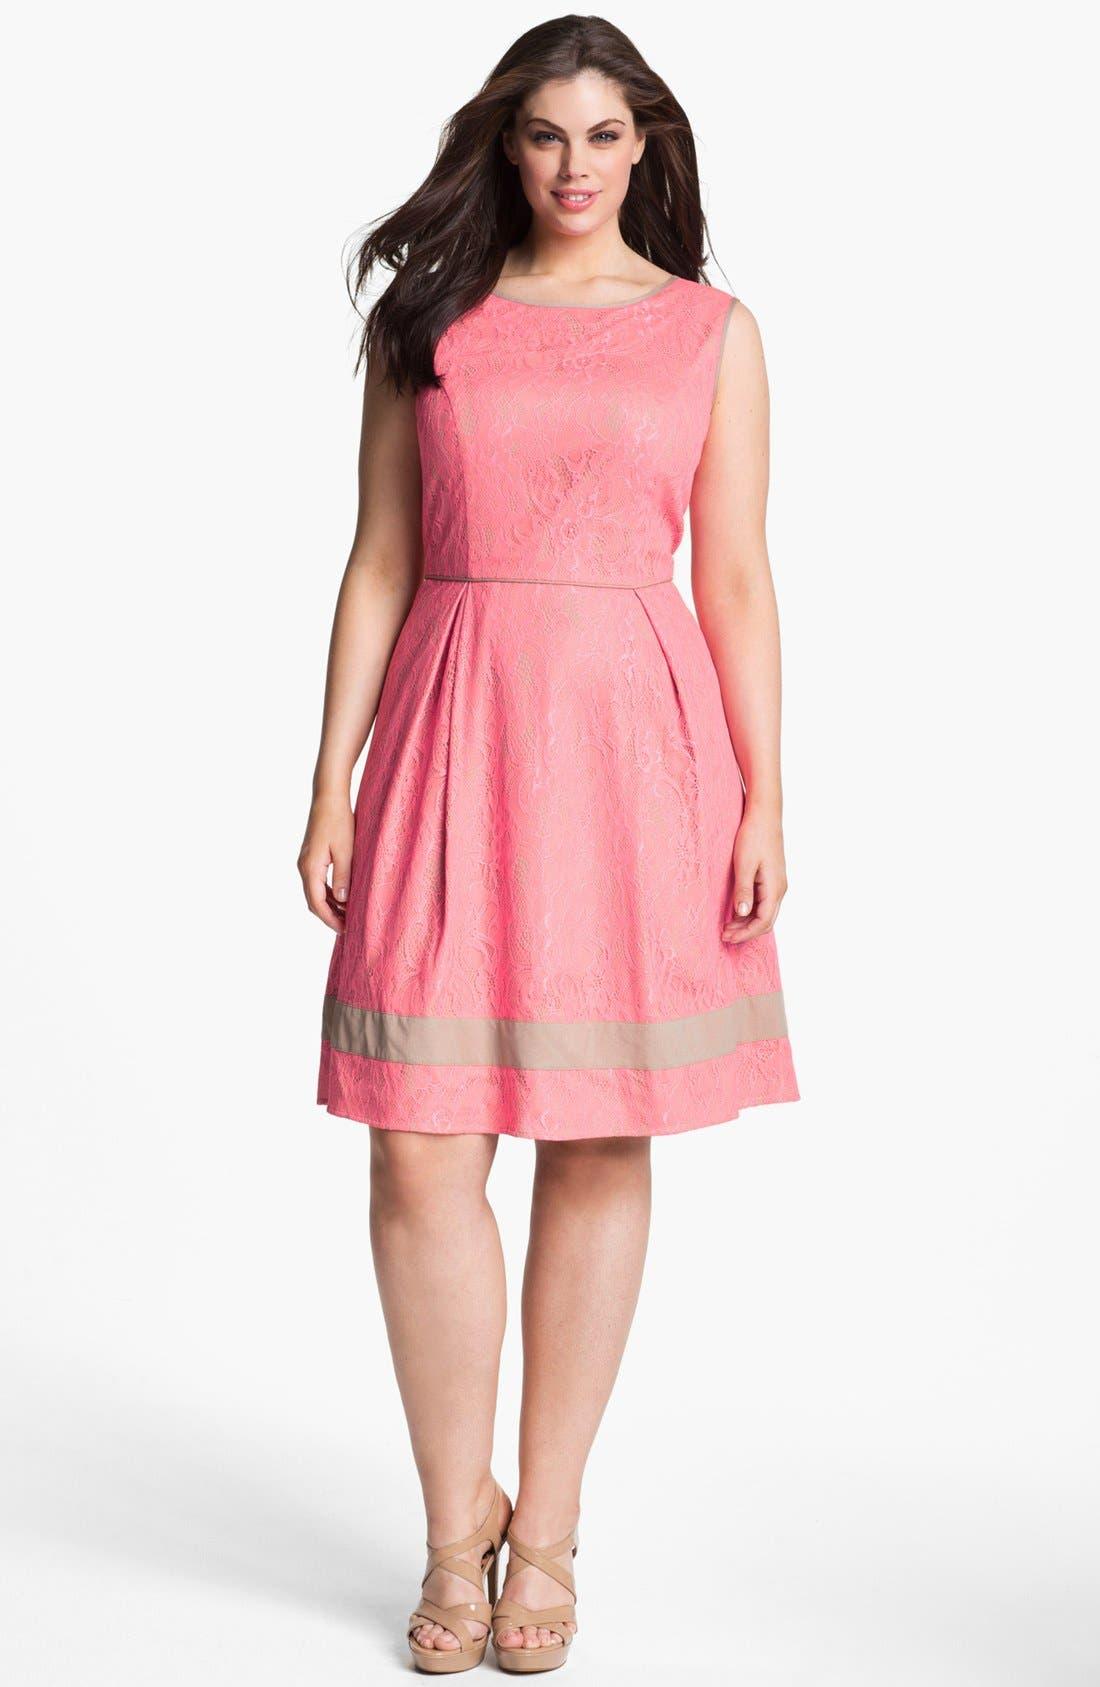 Main Image - Jessica Simpson Lace Fit & Flare Dress (Plus Size)